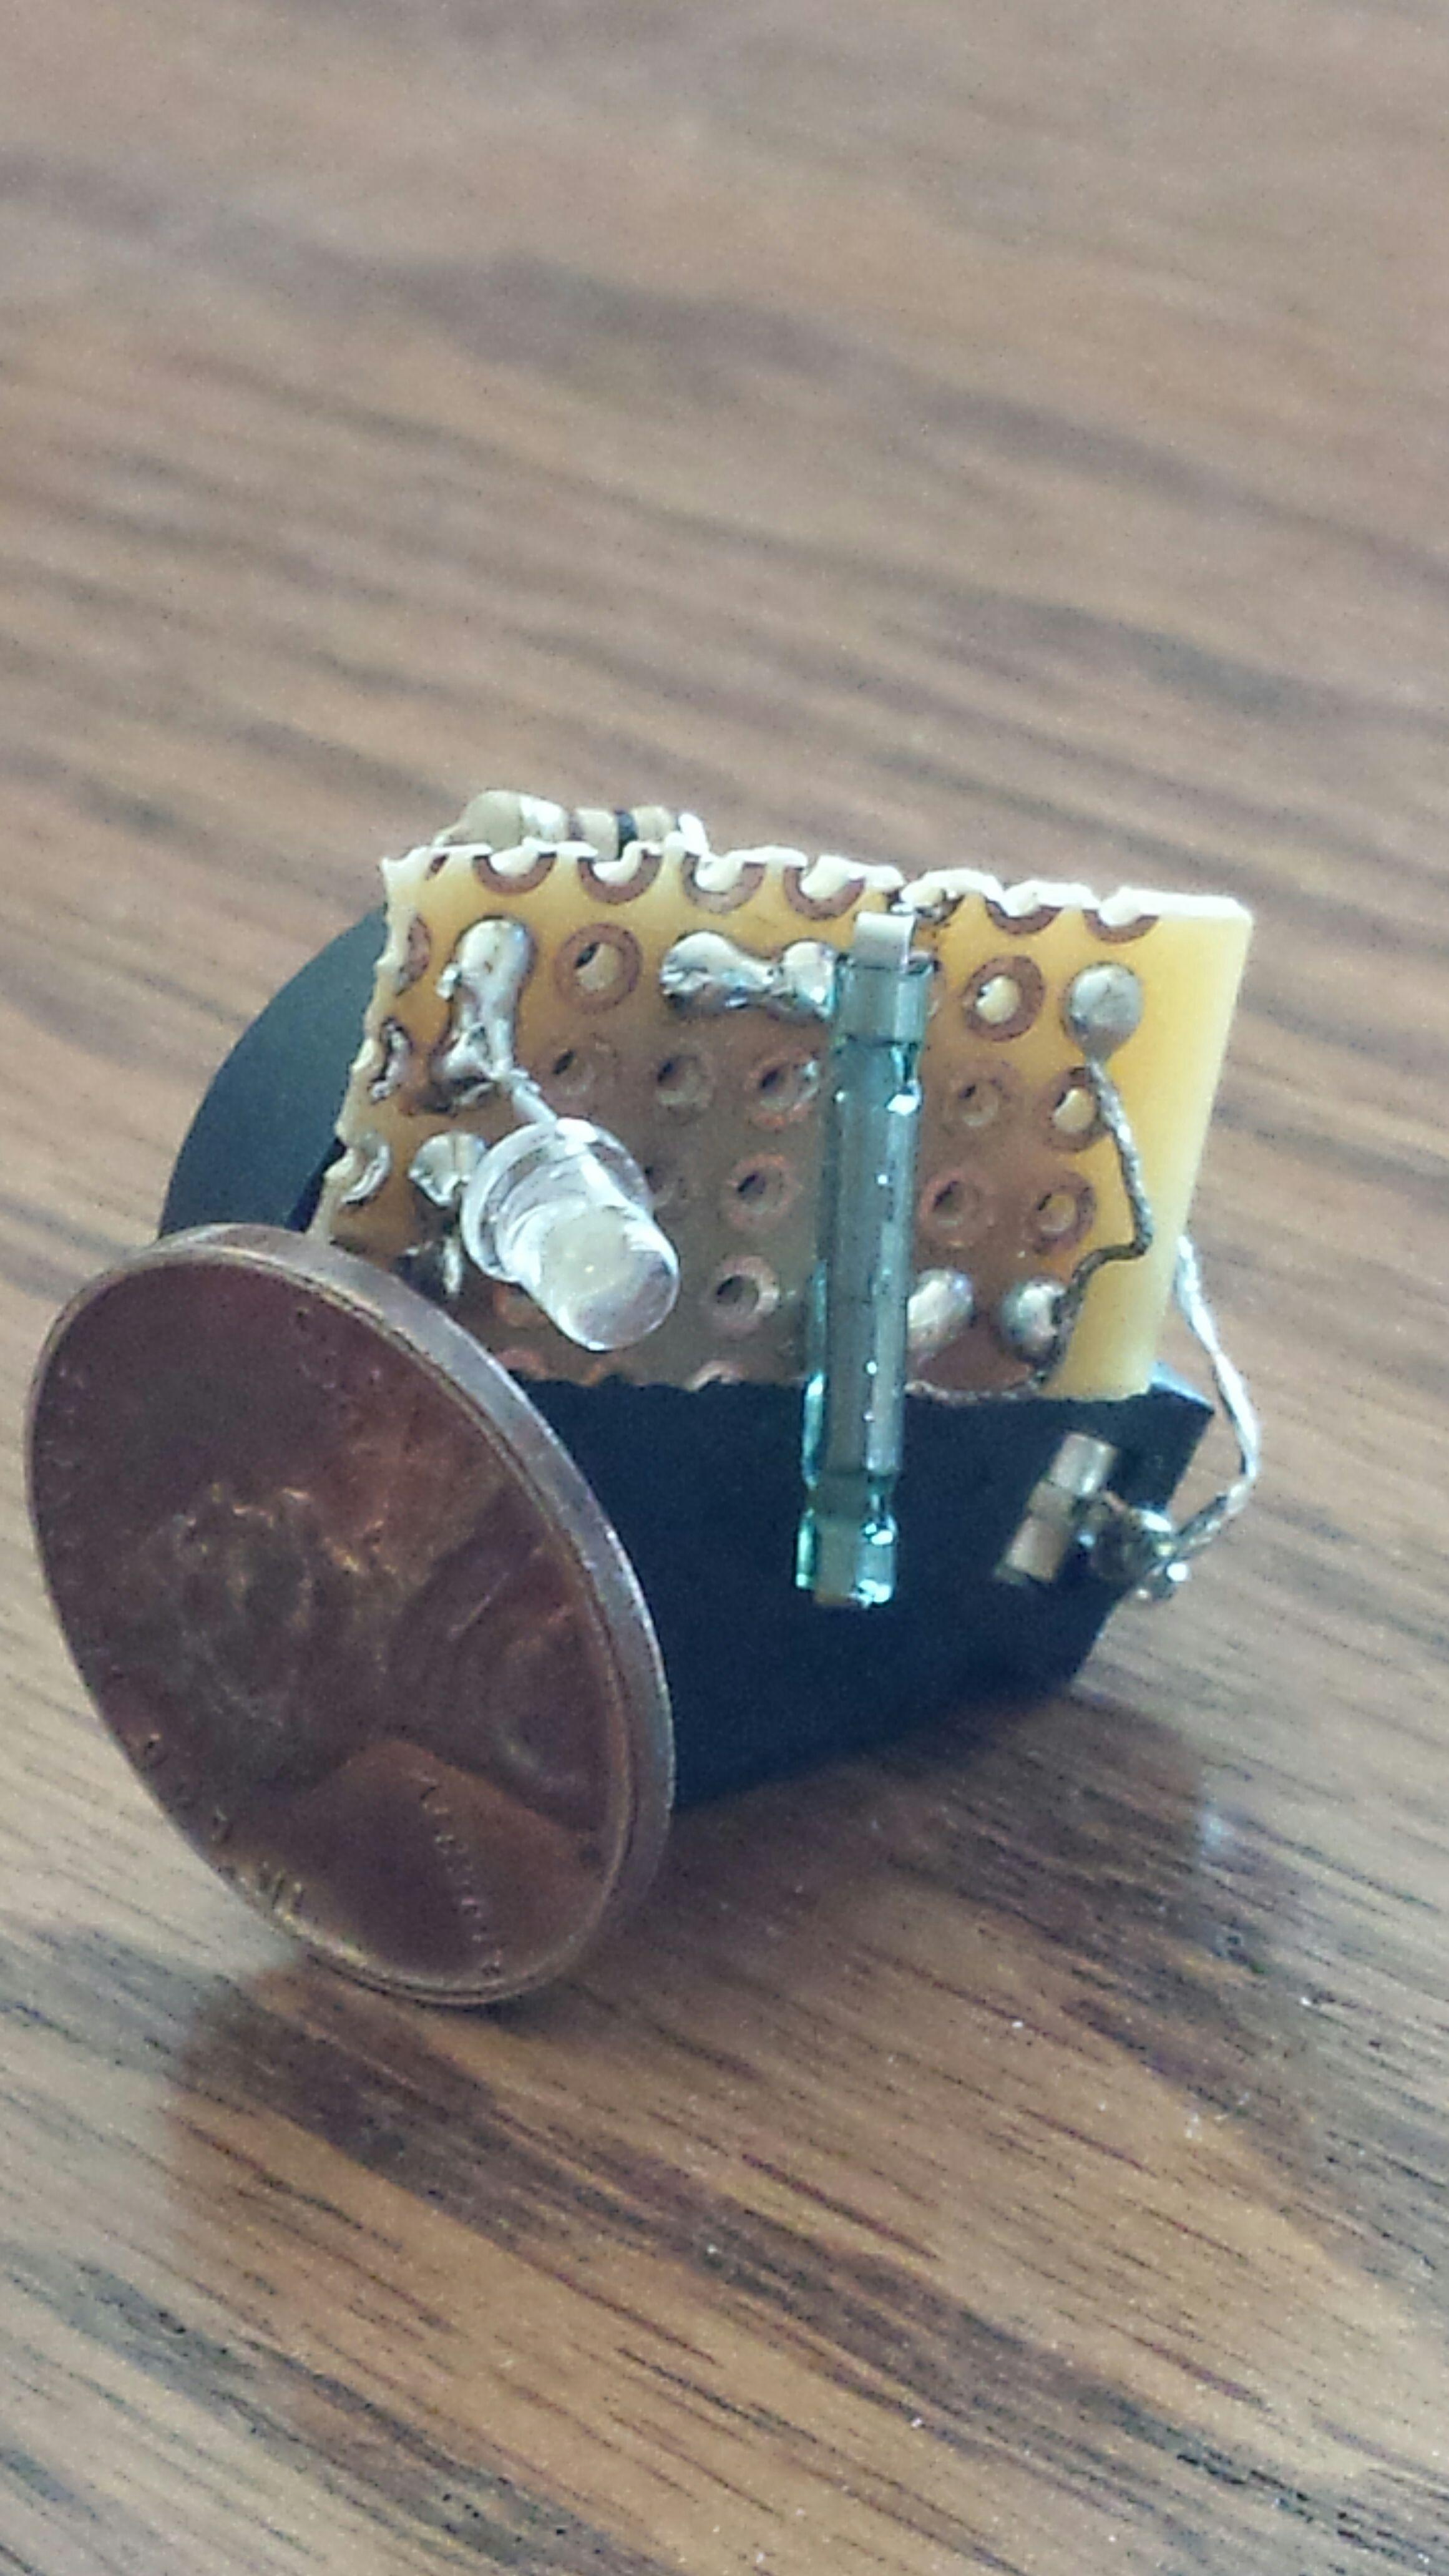 TinyLight- The Micro Flashlight